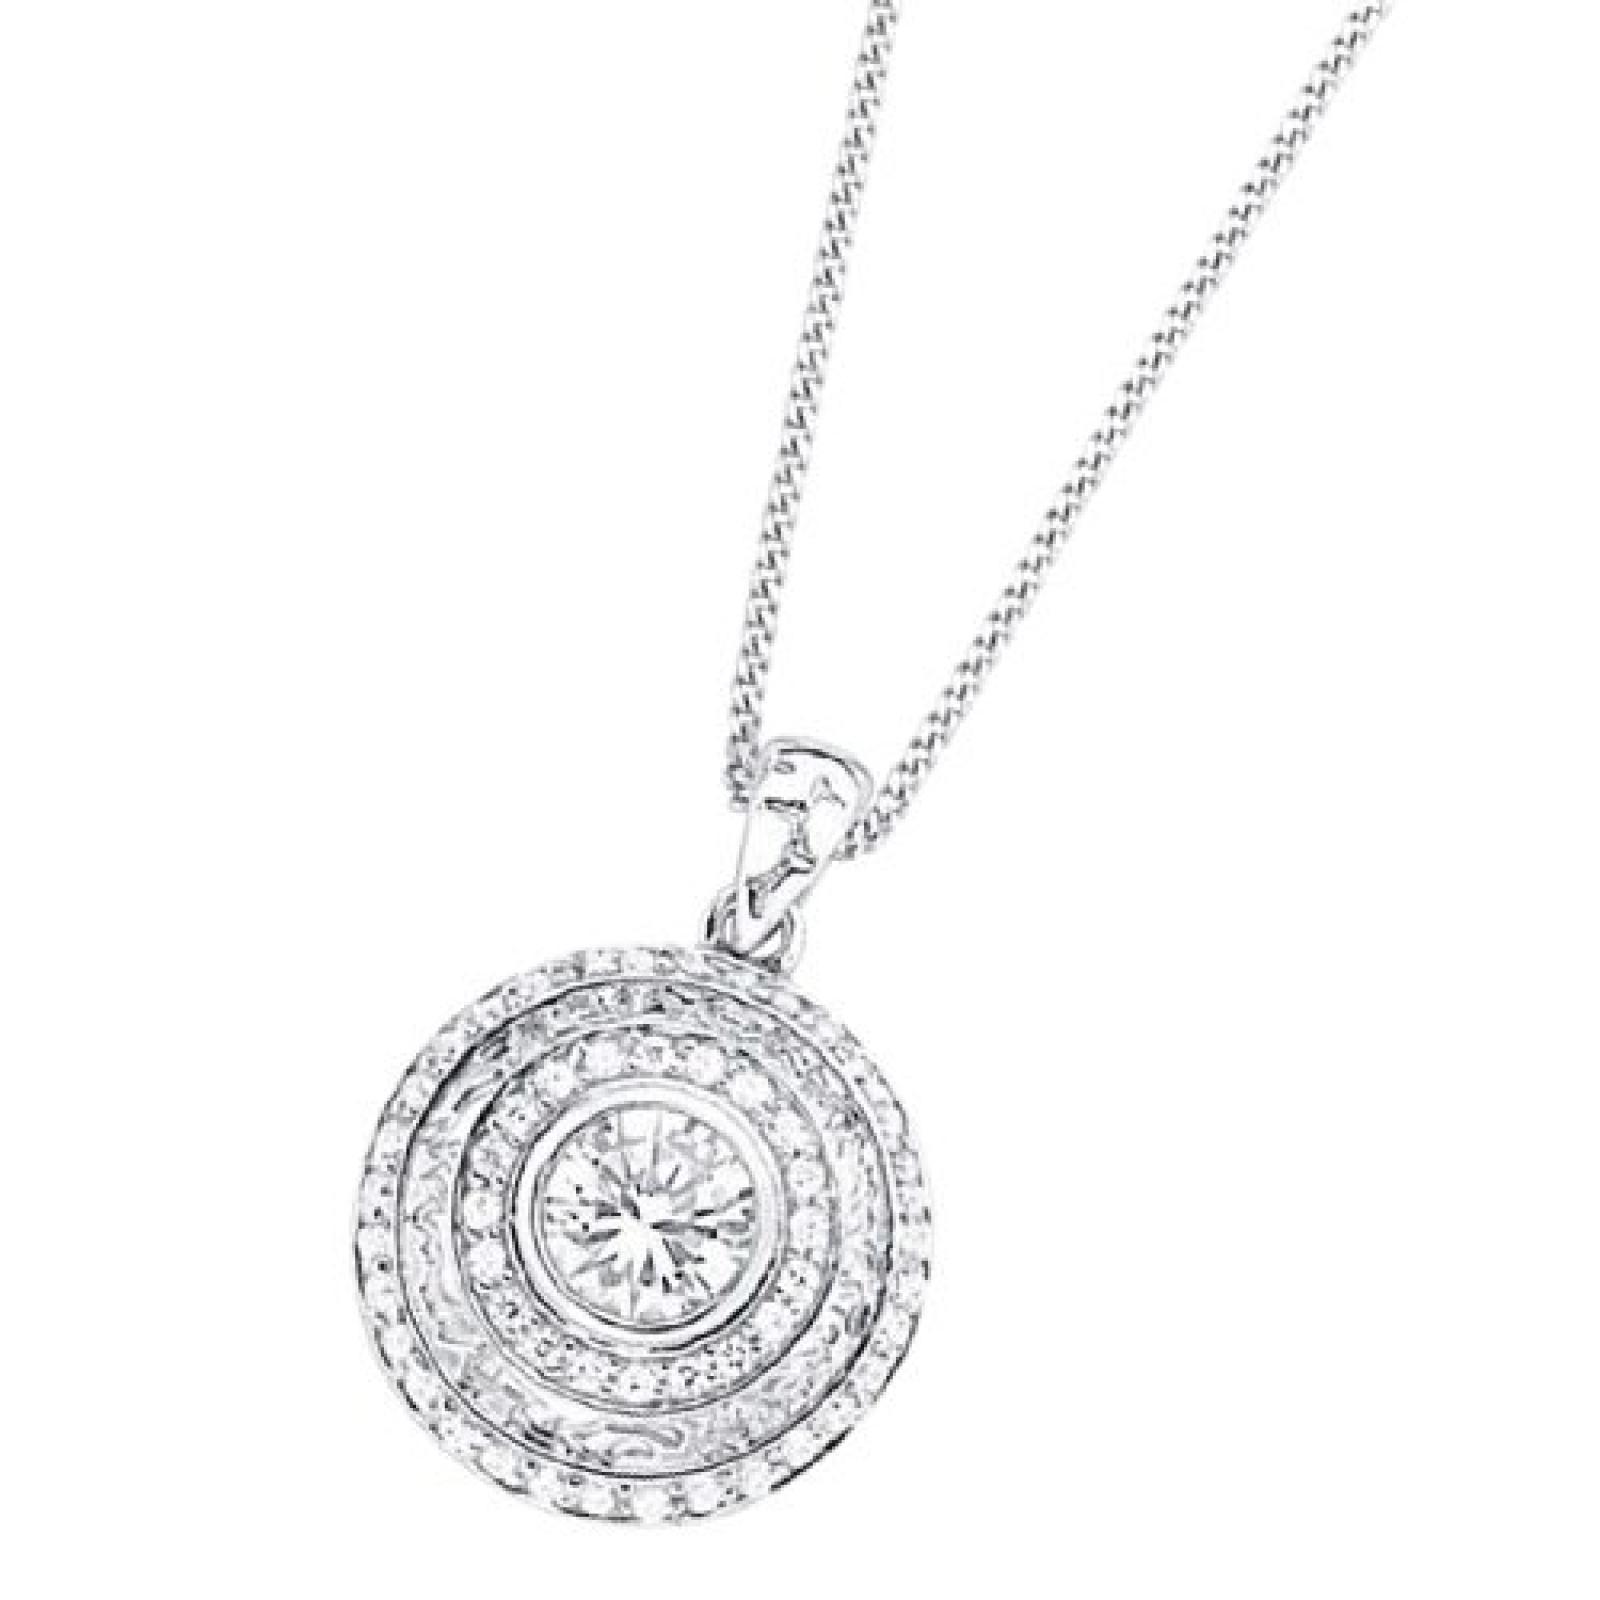 Celesta Damen-Halskette 925 Sterling Silber 42cm Zirkonia weiß 500244574L-42